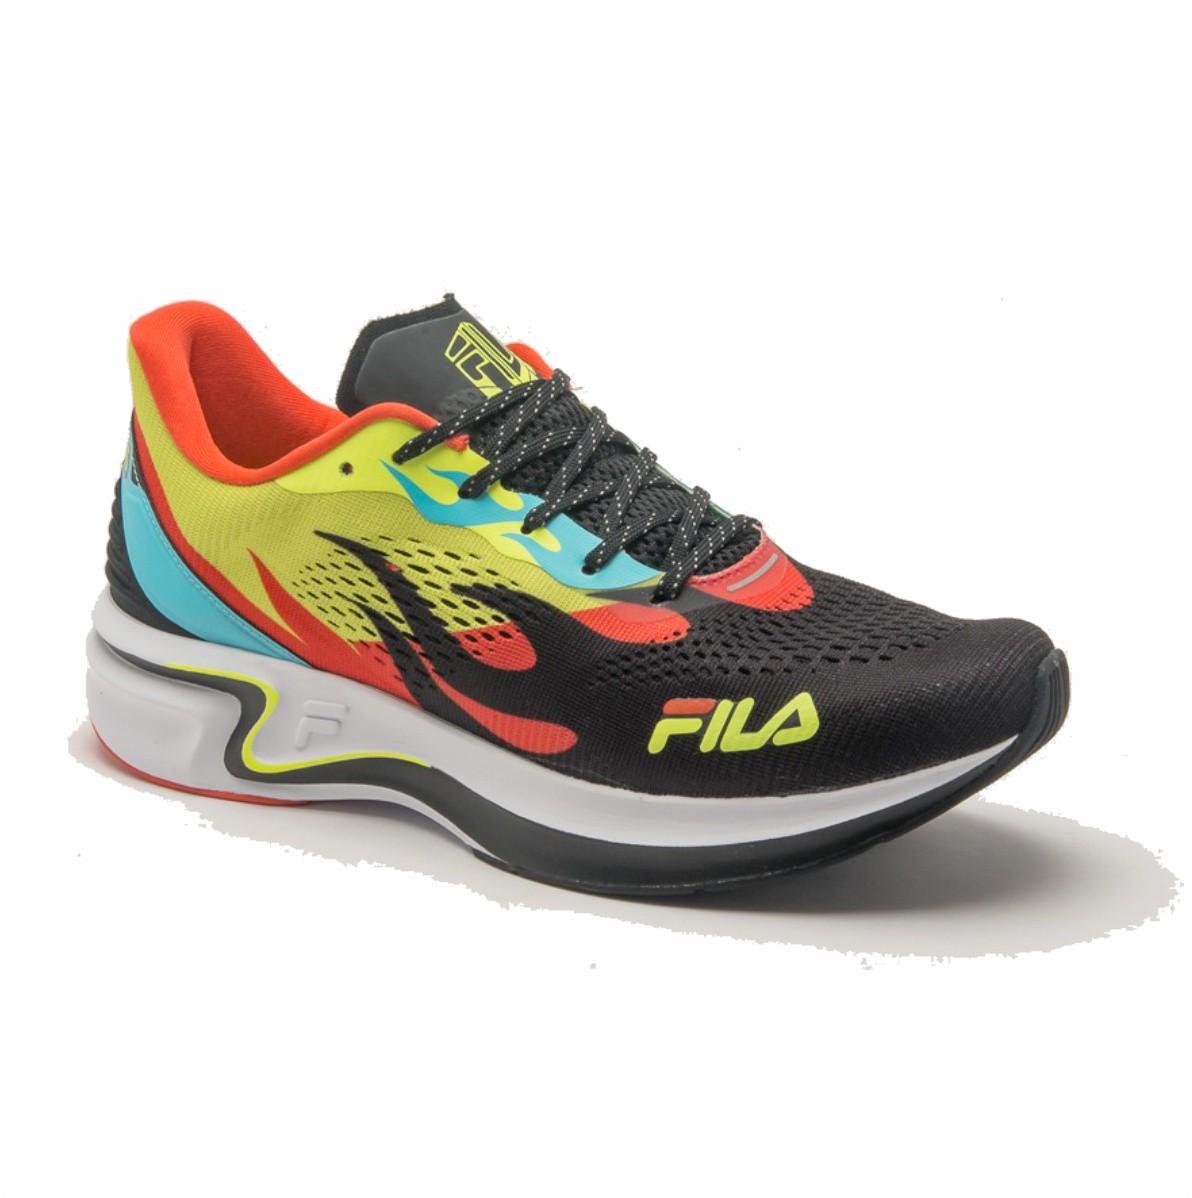 Tenis Fila Racer Silva Feminino Running Performance